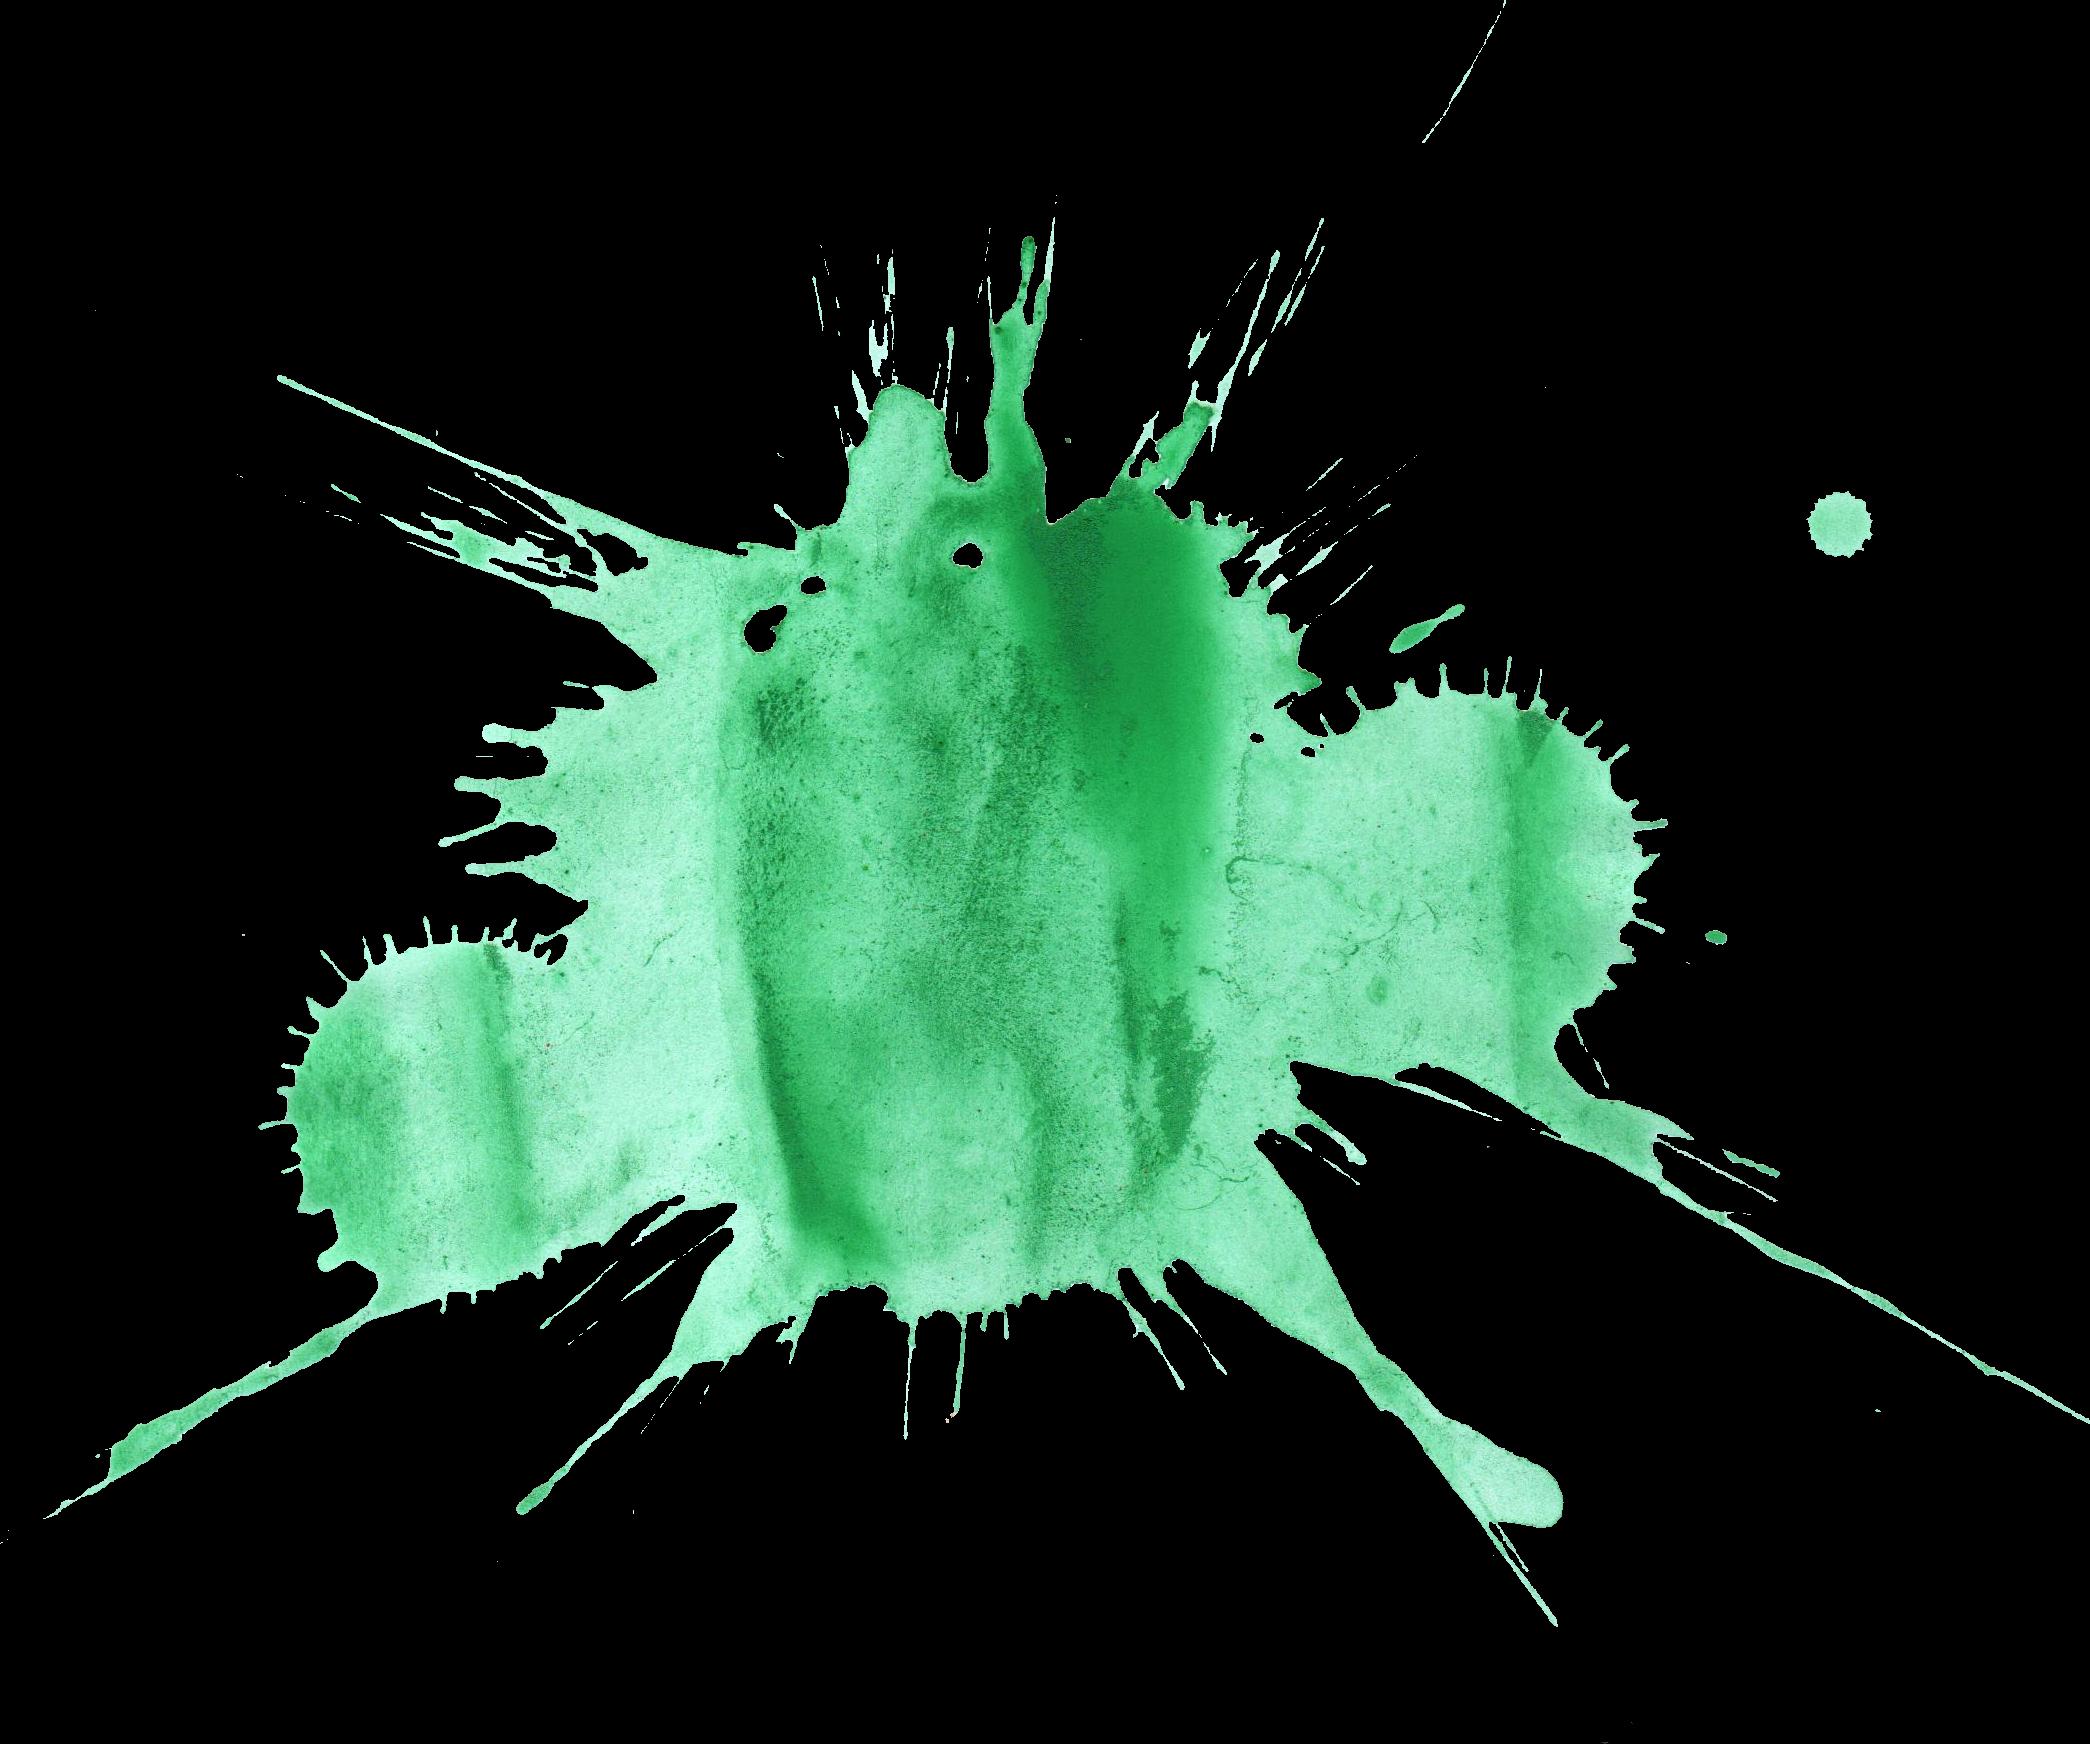 16 Green Watercolor Splatter (PNG Transparent) | OnlyGFX.com